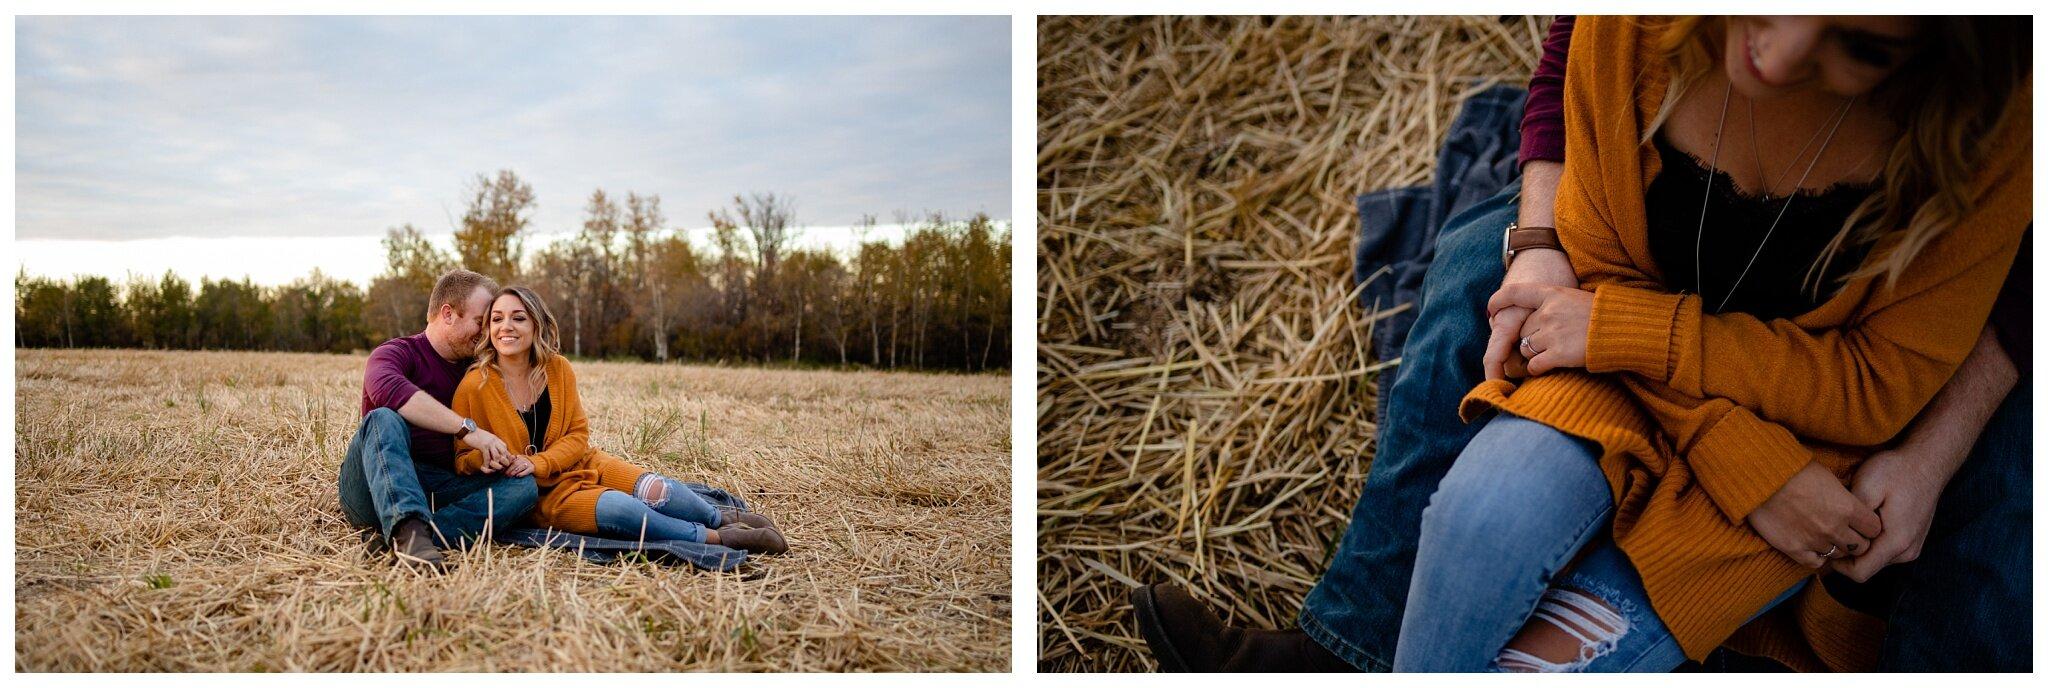 Edmonton Engagement Photographer Romantic Couples Photos Local YEG Strathcona County_0016.jpg